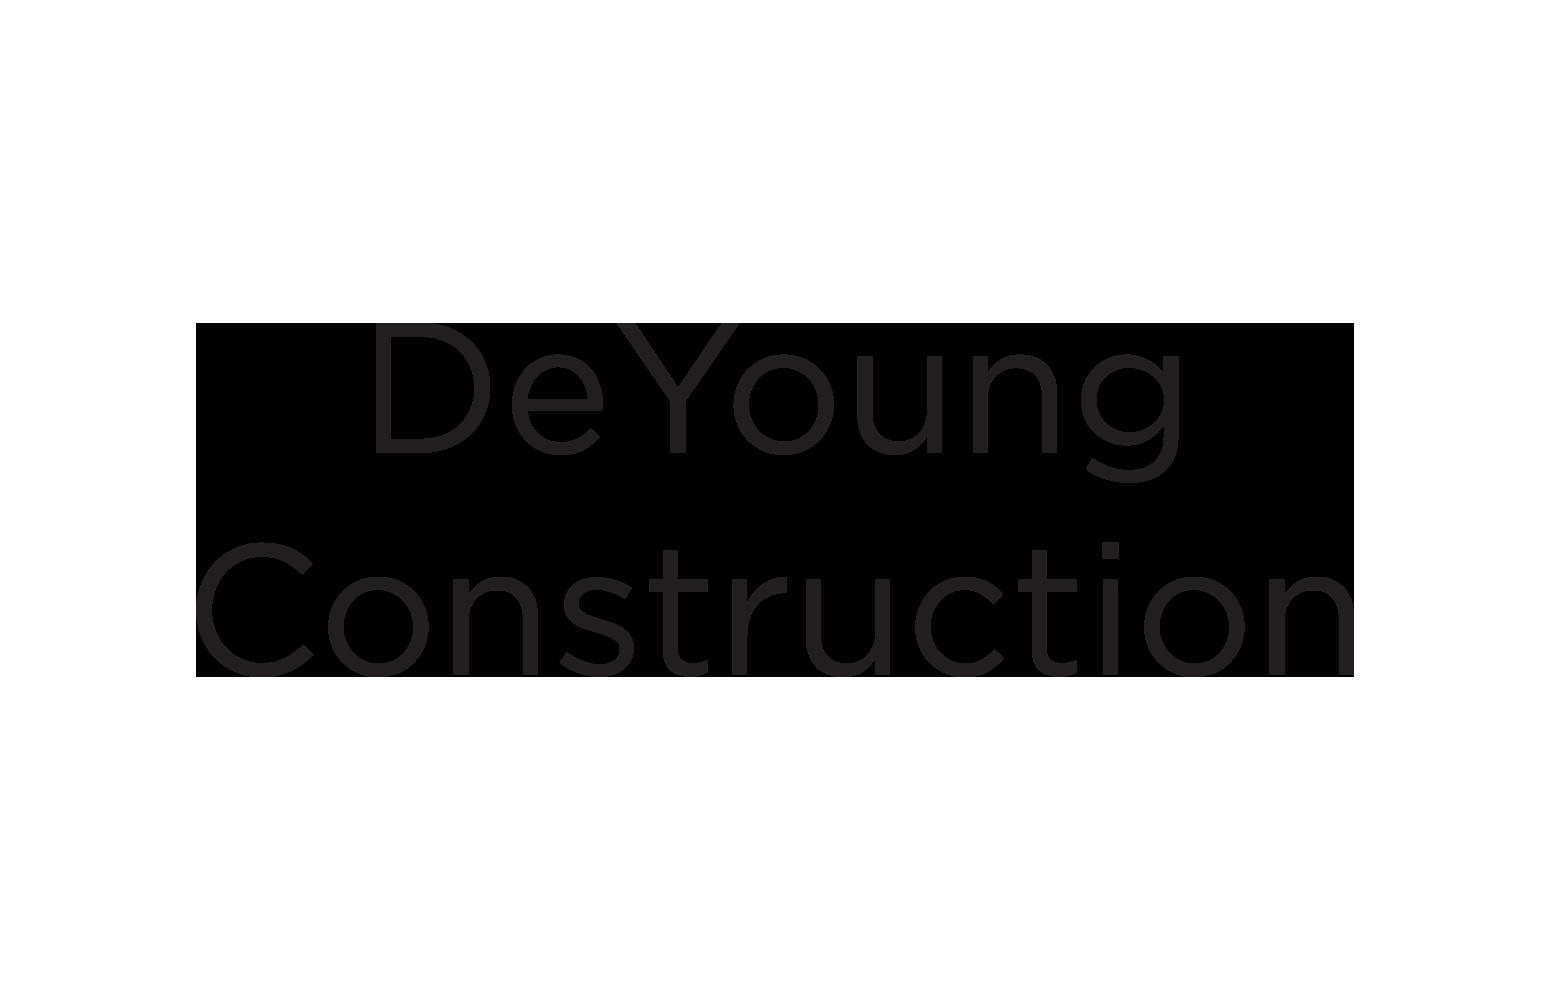 DeYoung Construction